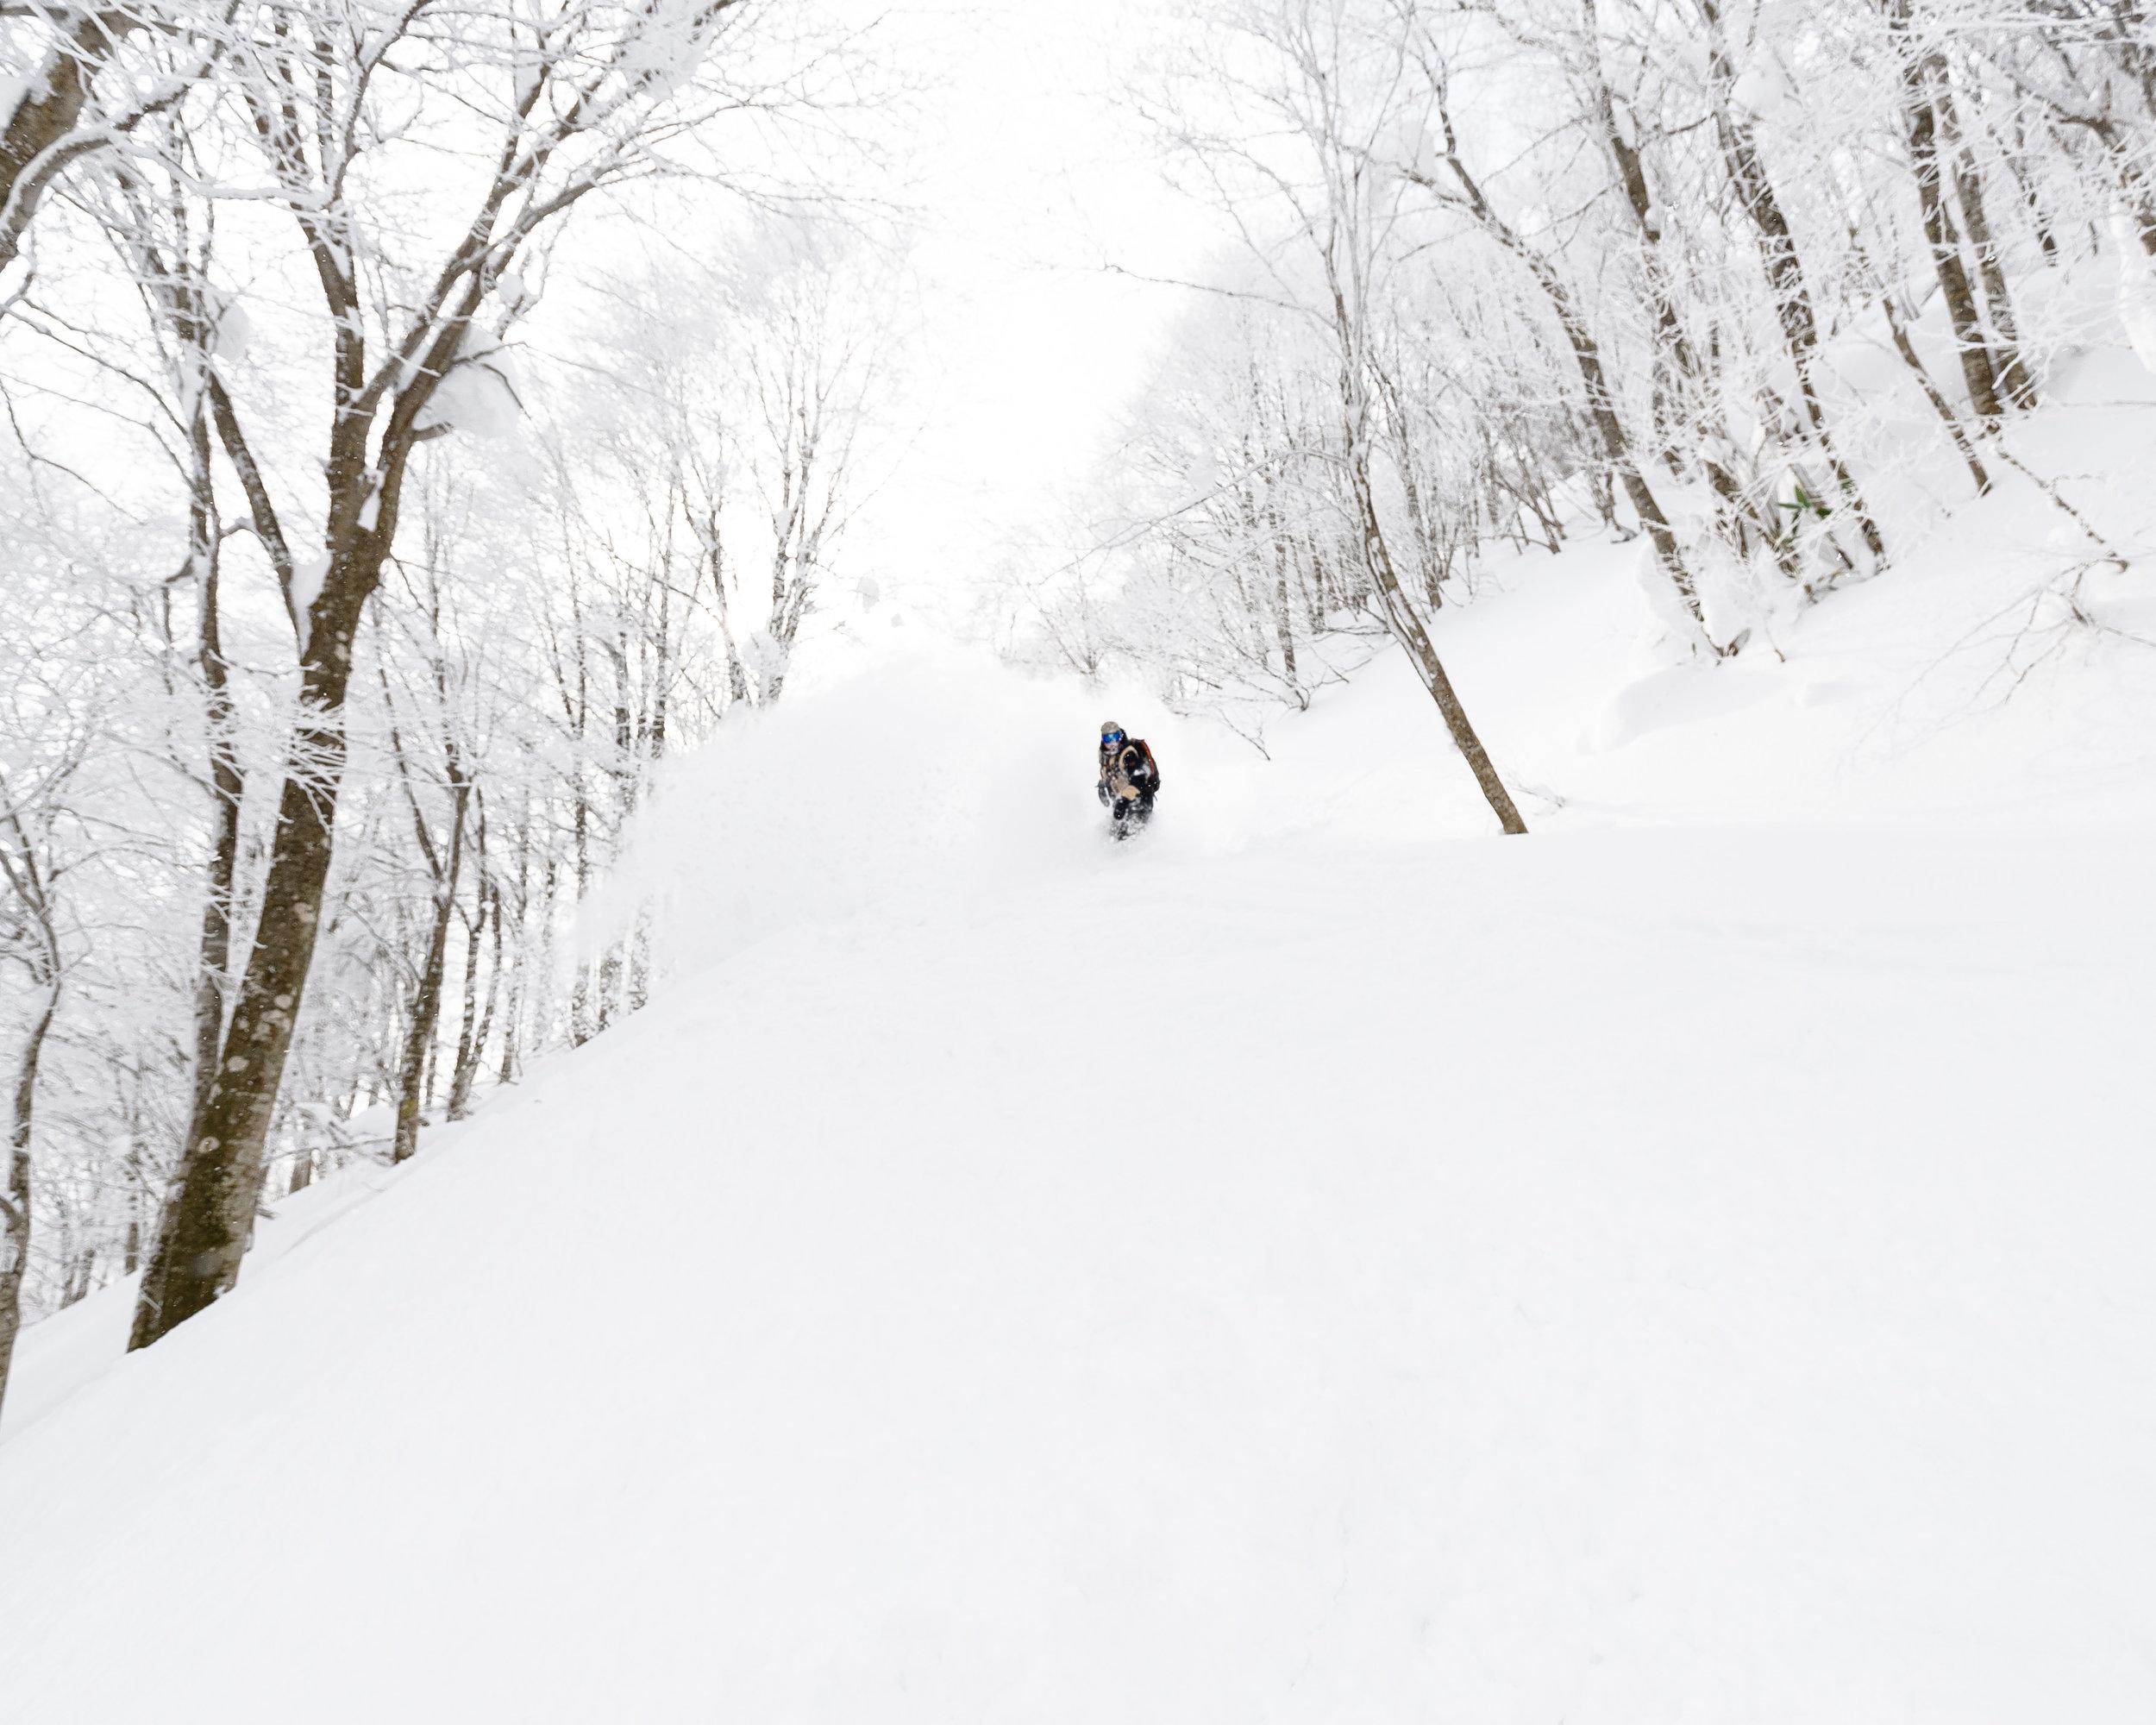 JGasaway_Skiing-20.jpg